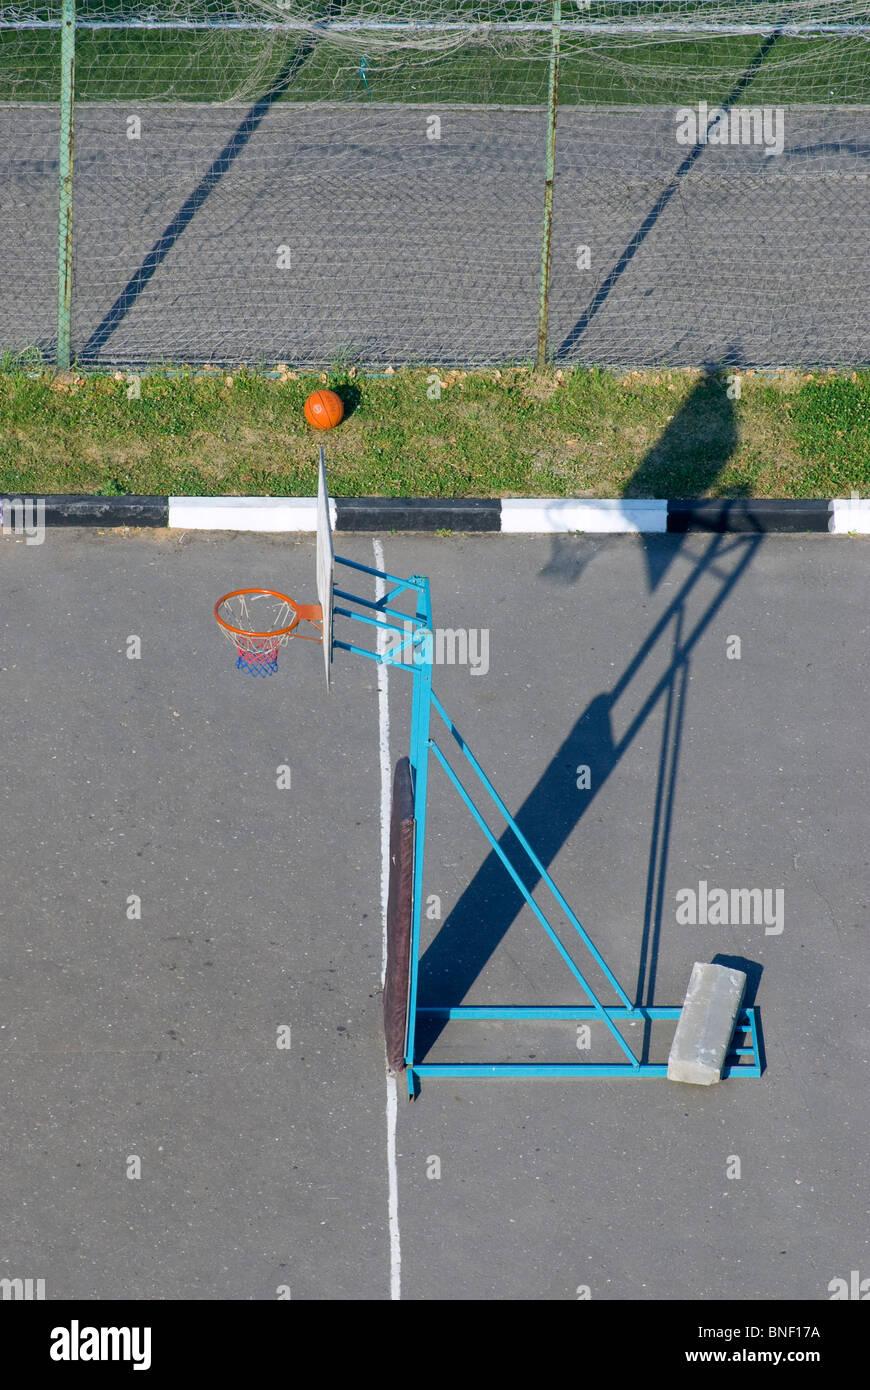 Street basketball sporting area Stock Photo